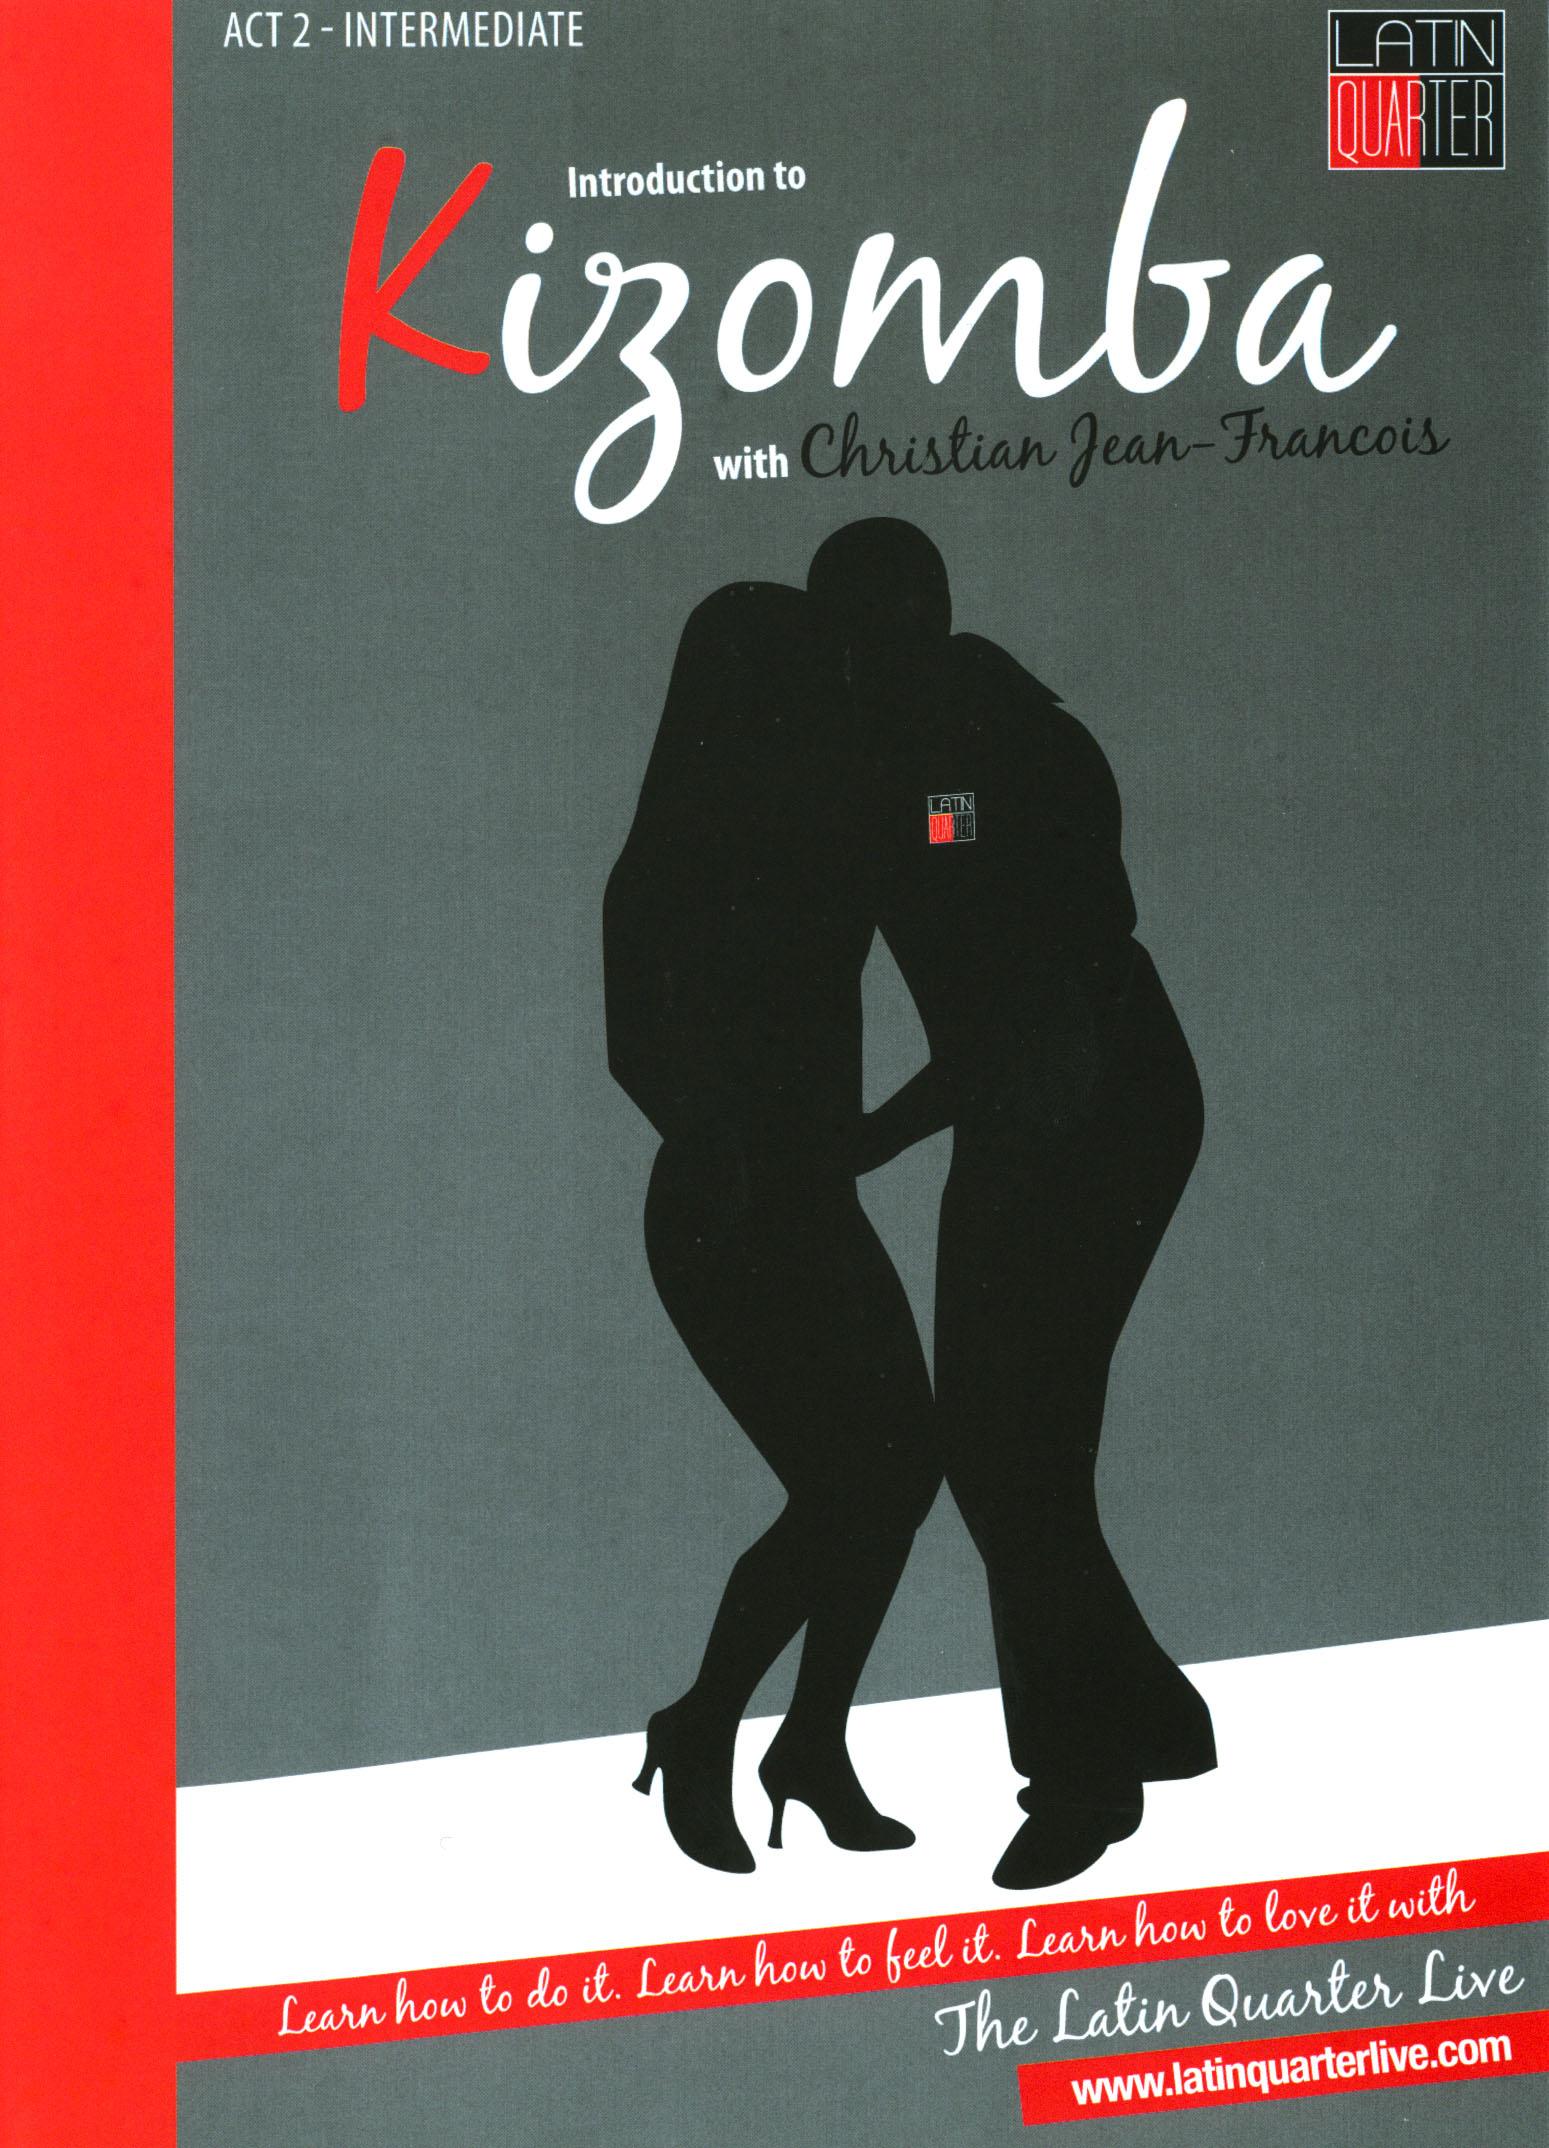 Introduction to Kizomba: Act 2 - Intermediate